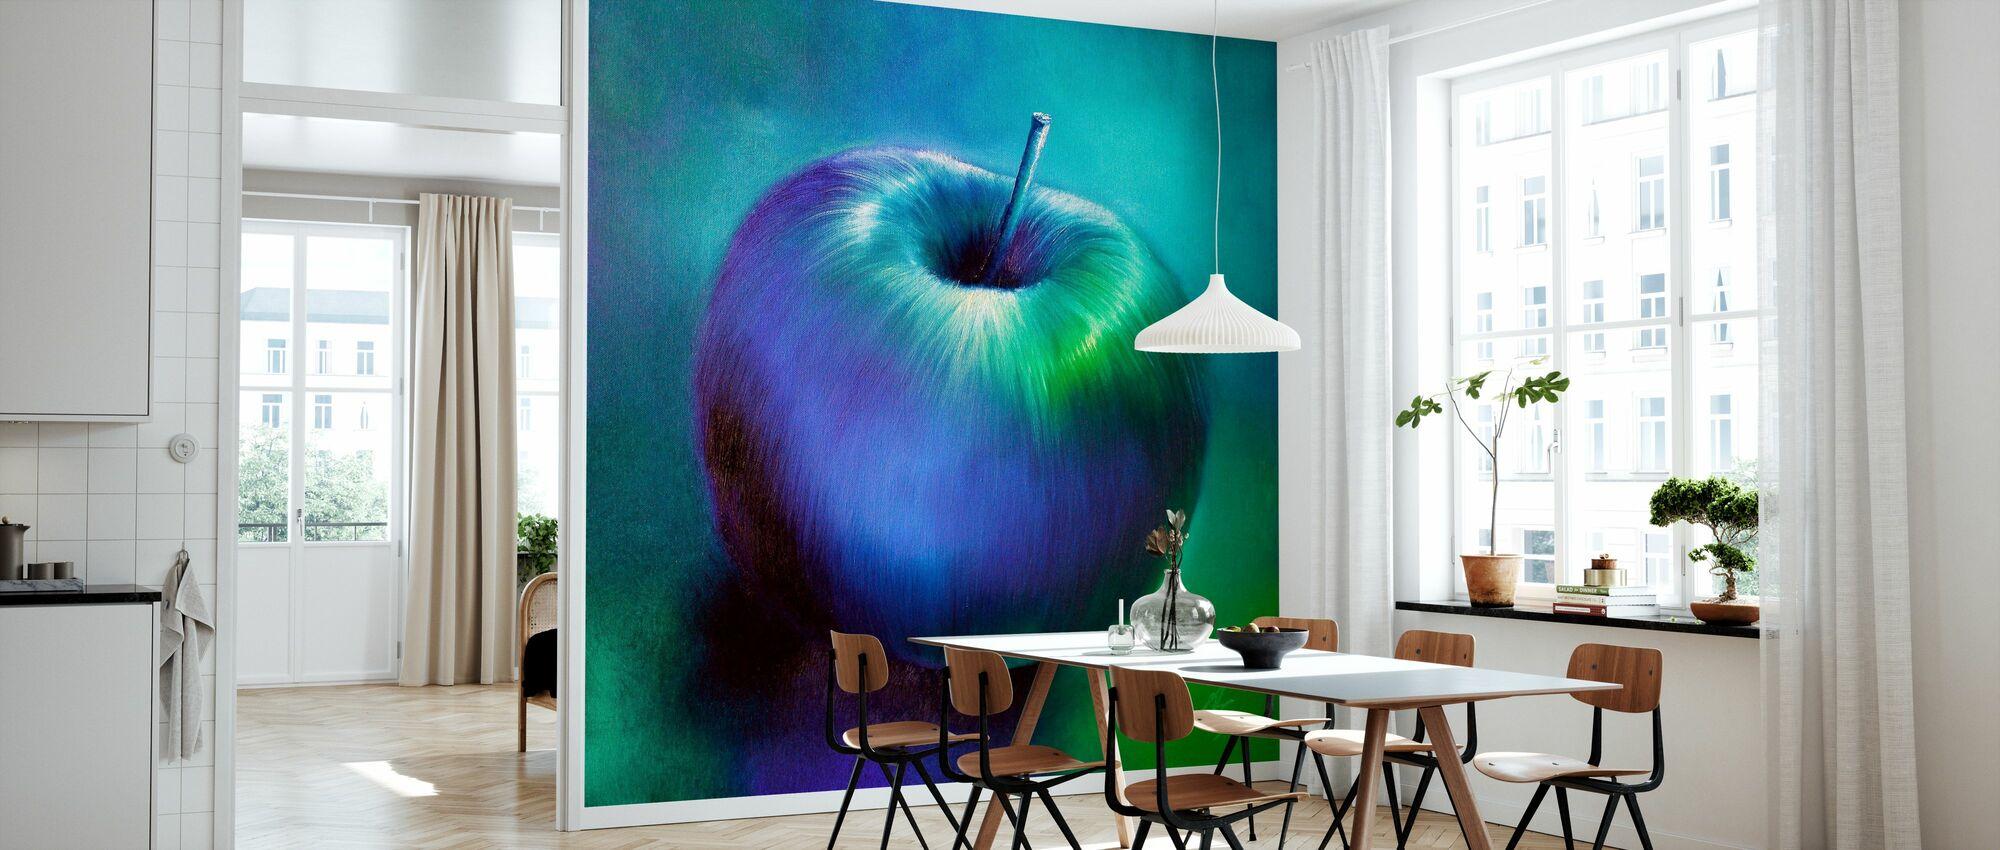 Apple Blue - Wallpaper - Kitchen